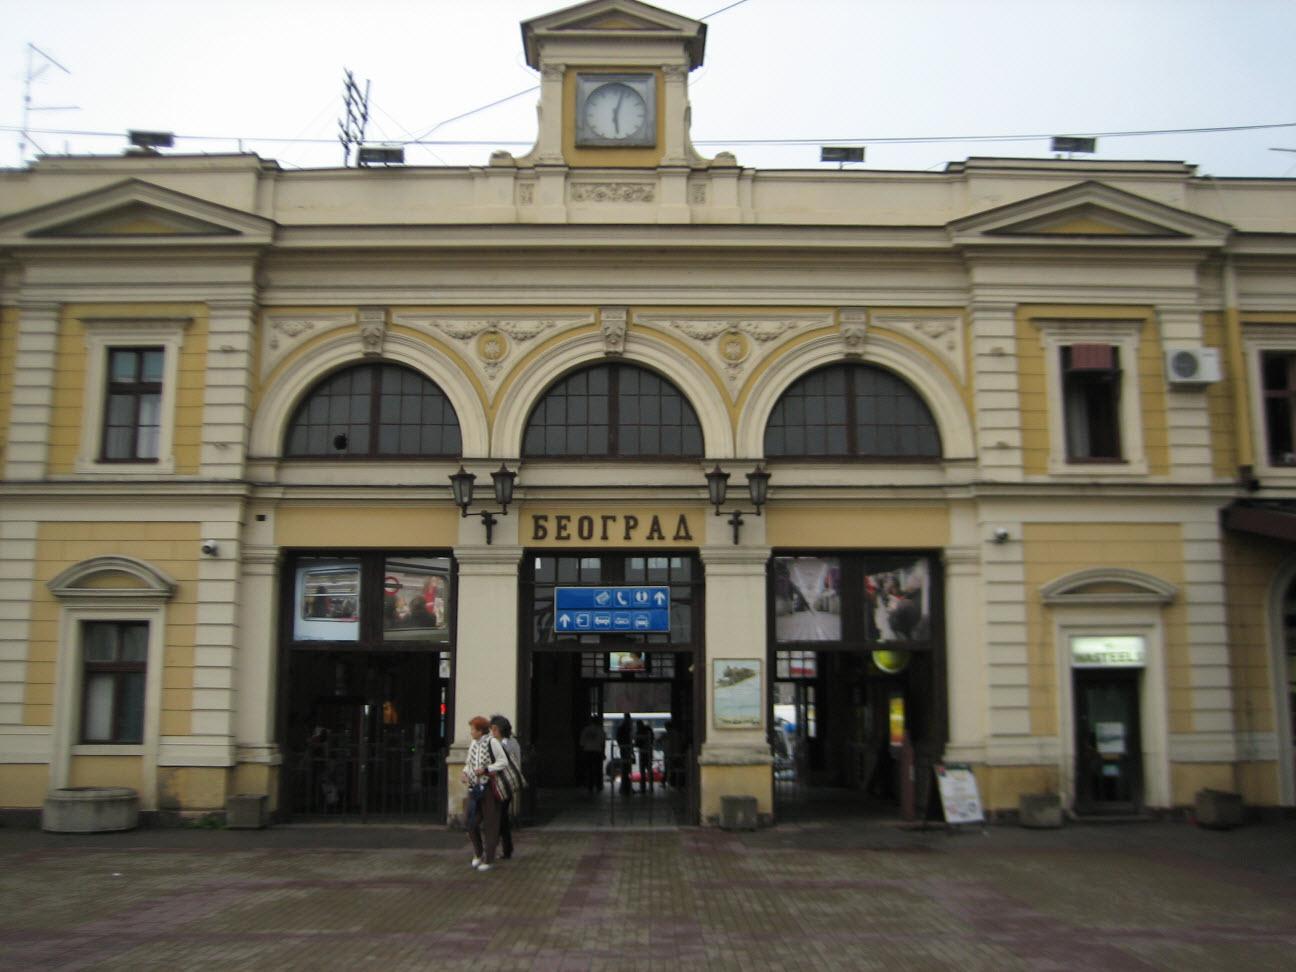 28/08/2008: Beograd , Serbia